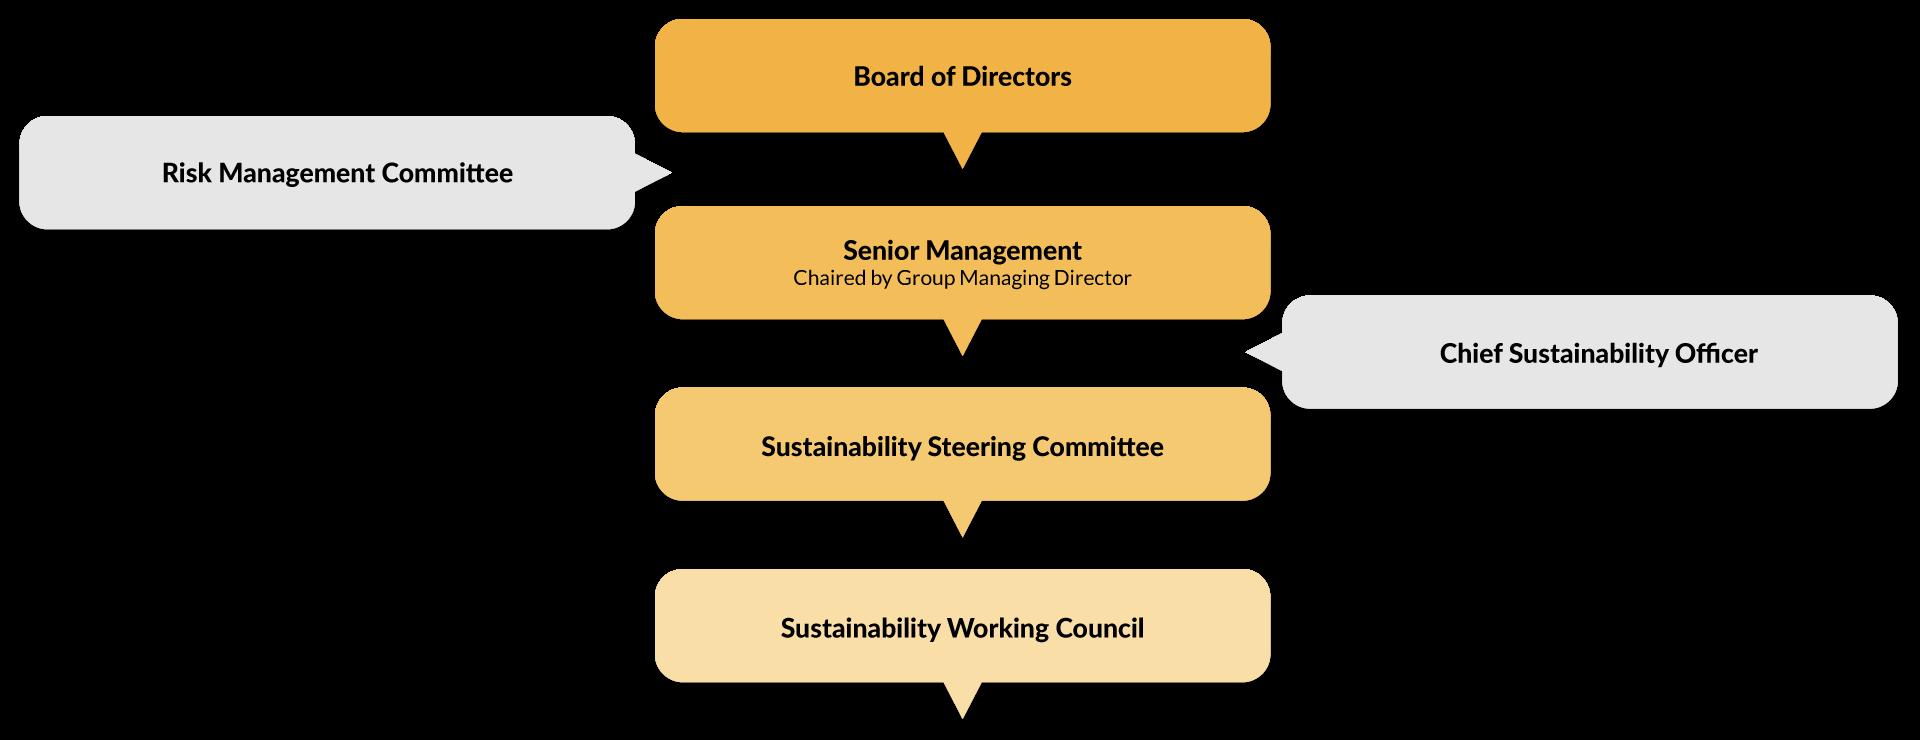 Gamuda's Sustainability Governance Structure